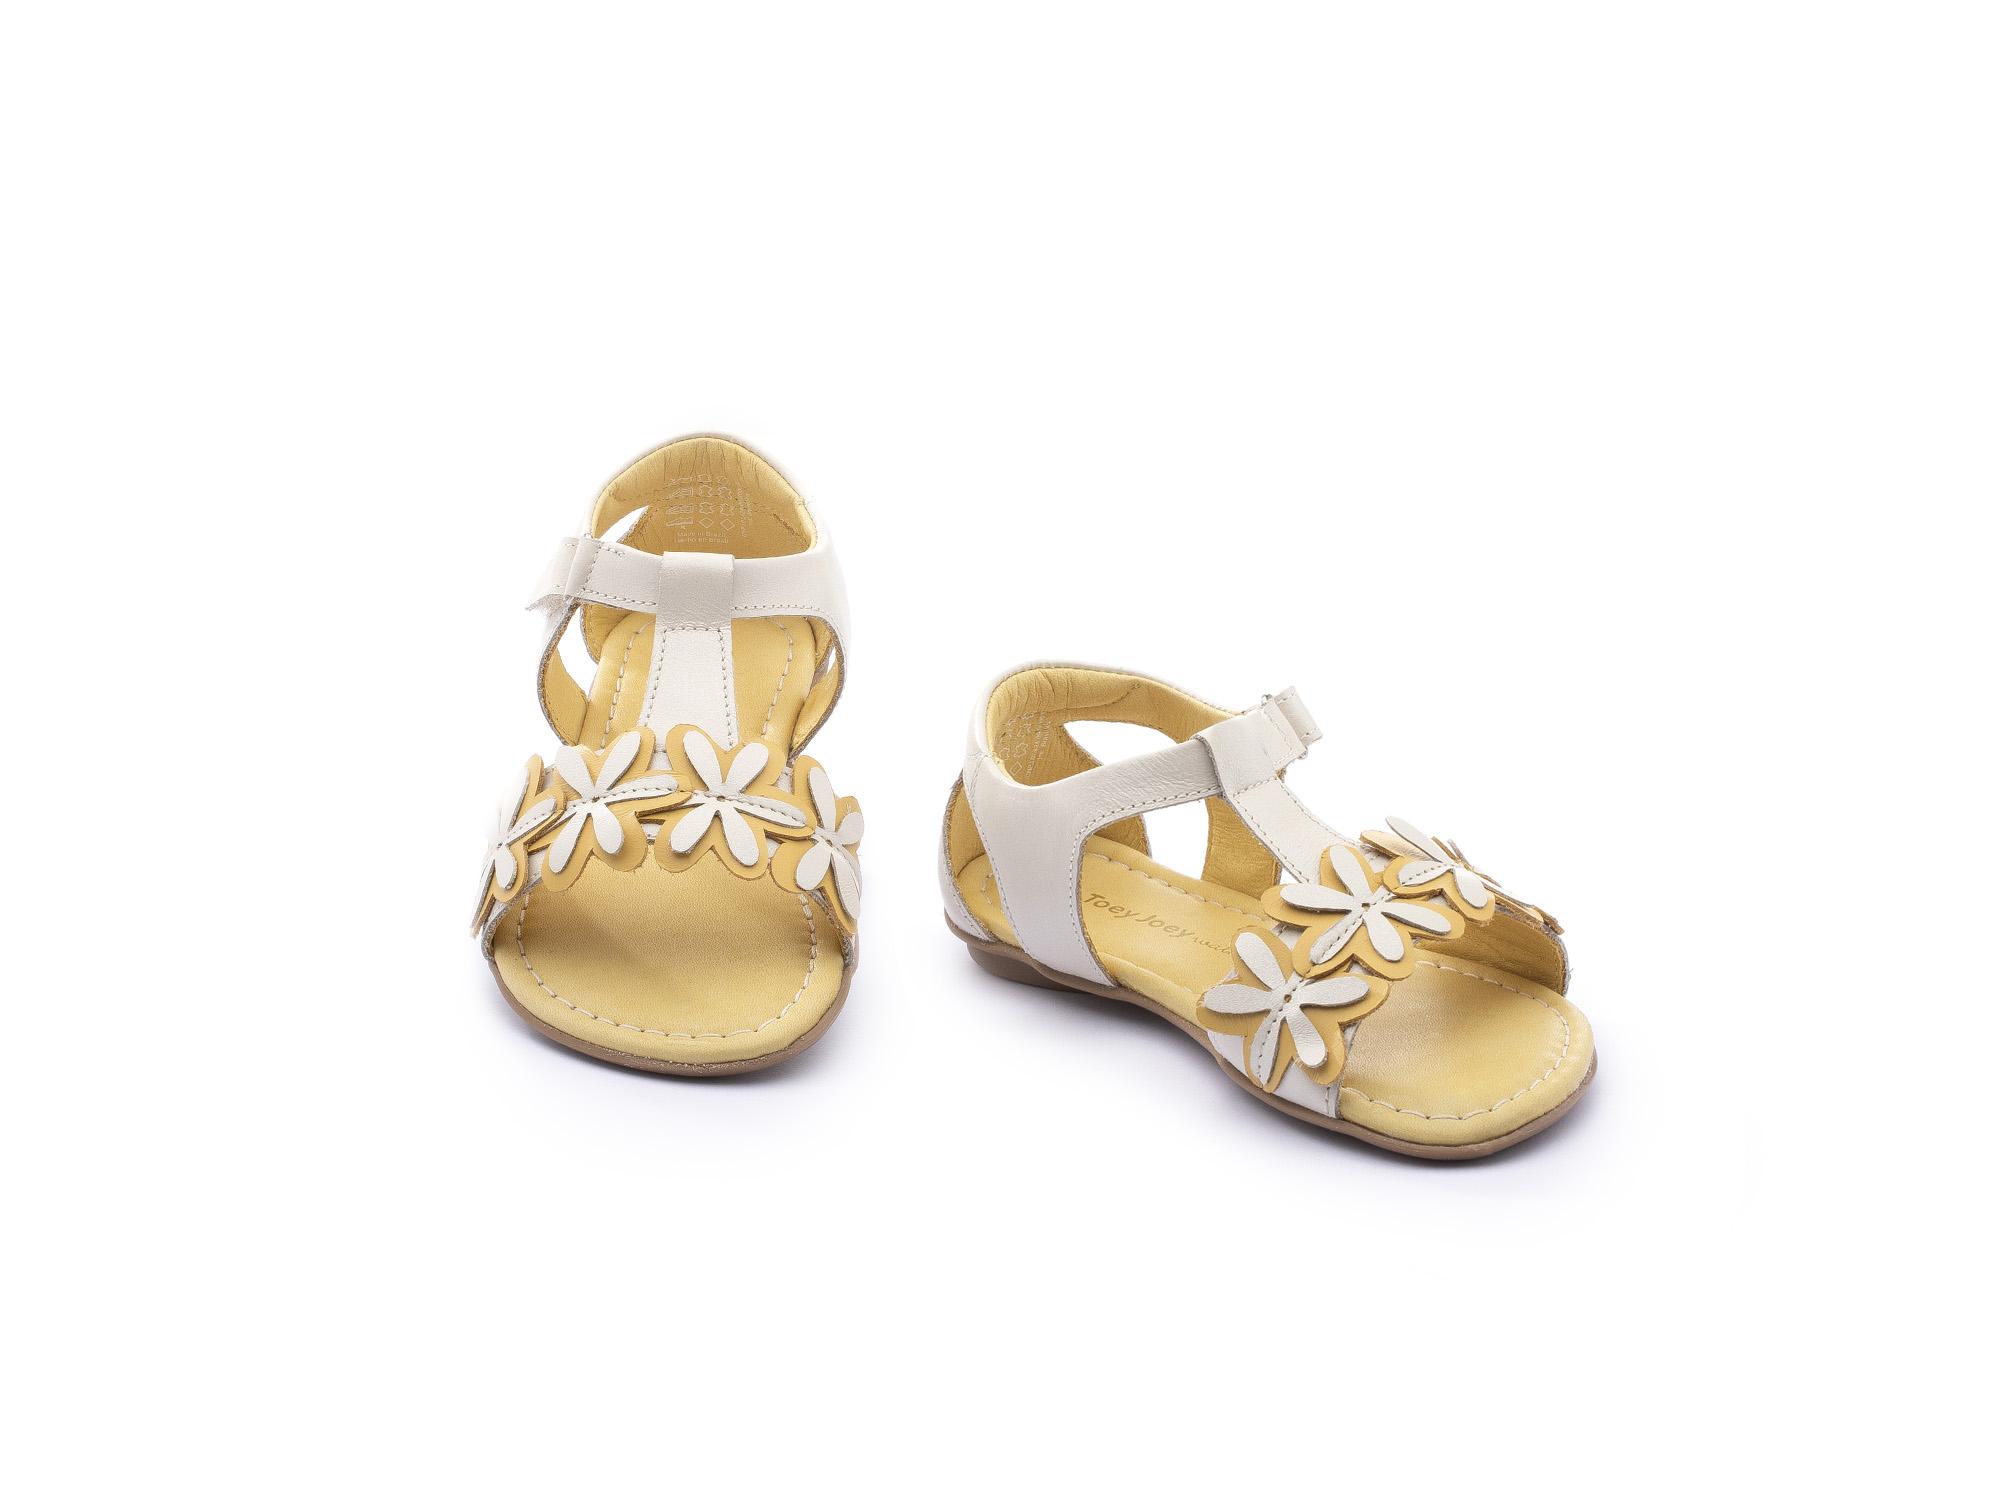 Sandália Little Daisies Antique White/ Pequi Toddler 2 à 4 anos - 2